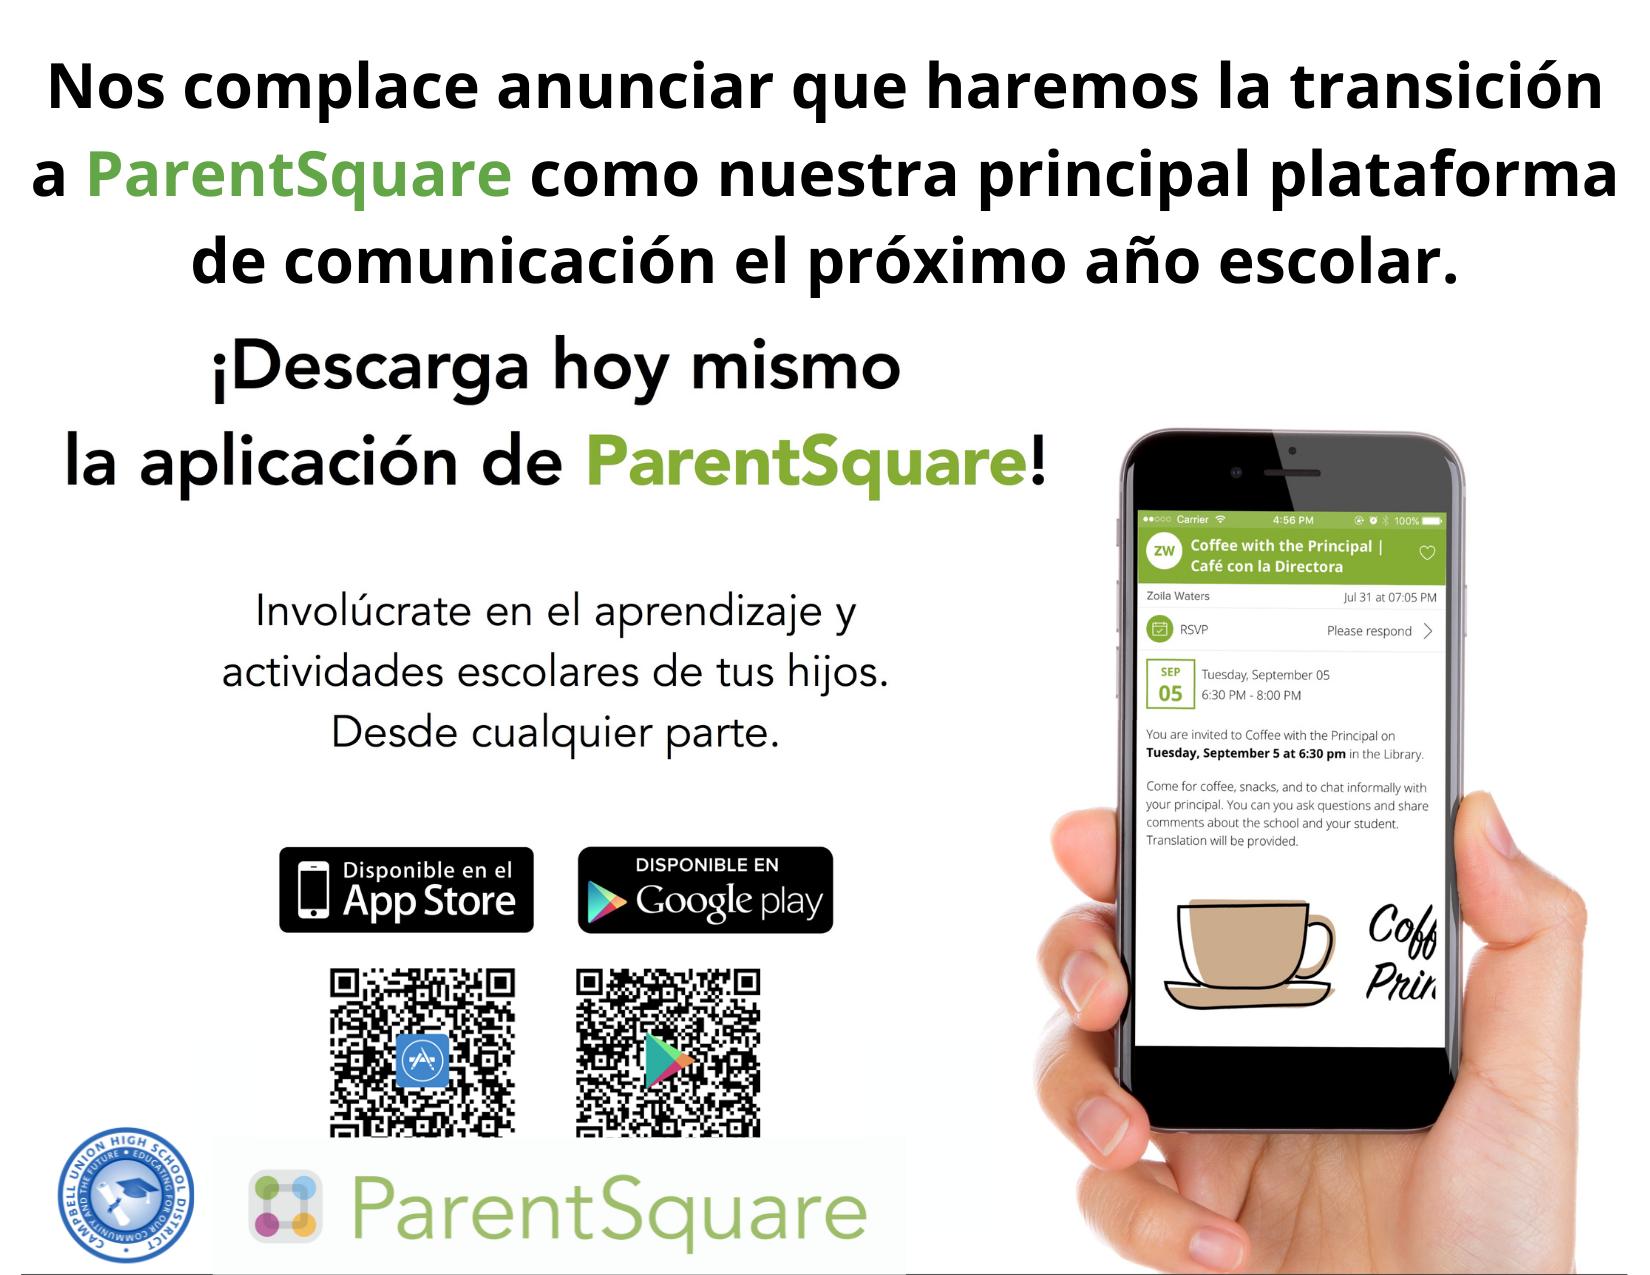 parentsquare flyer in spanish